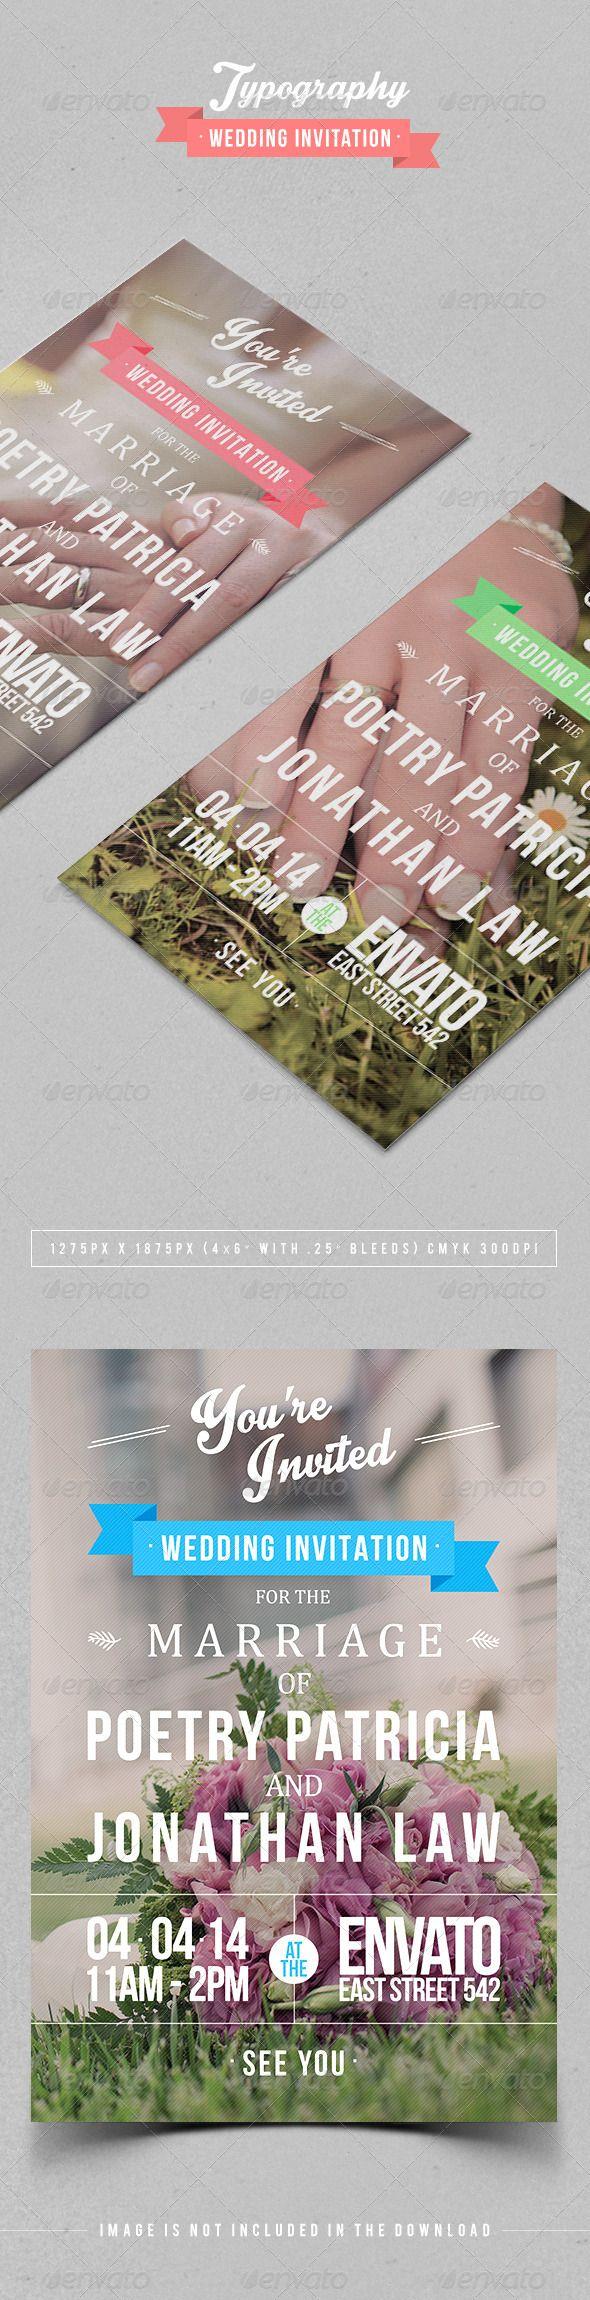 wedding invitation design psd%0A Typography Wedding Invitation